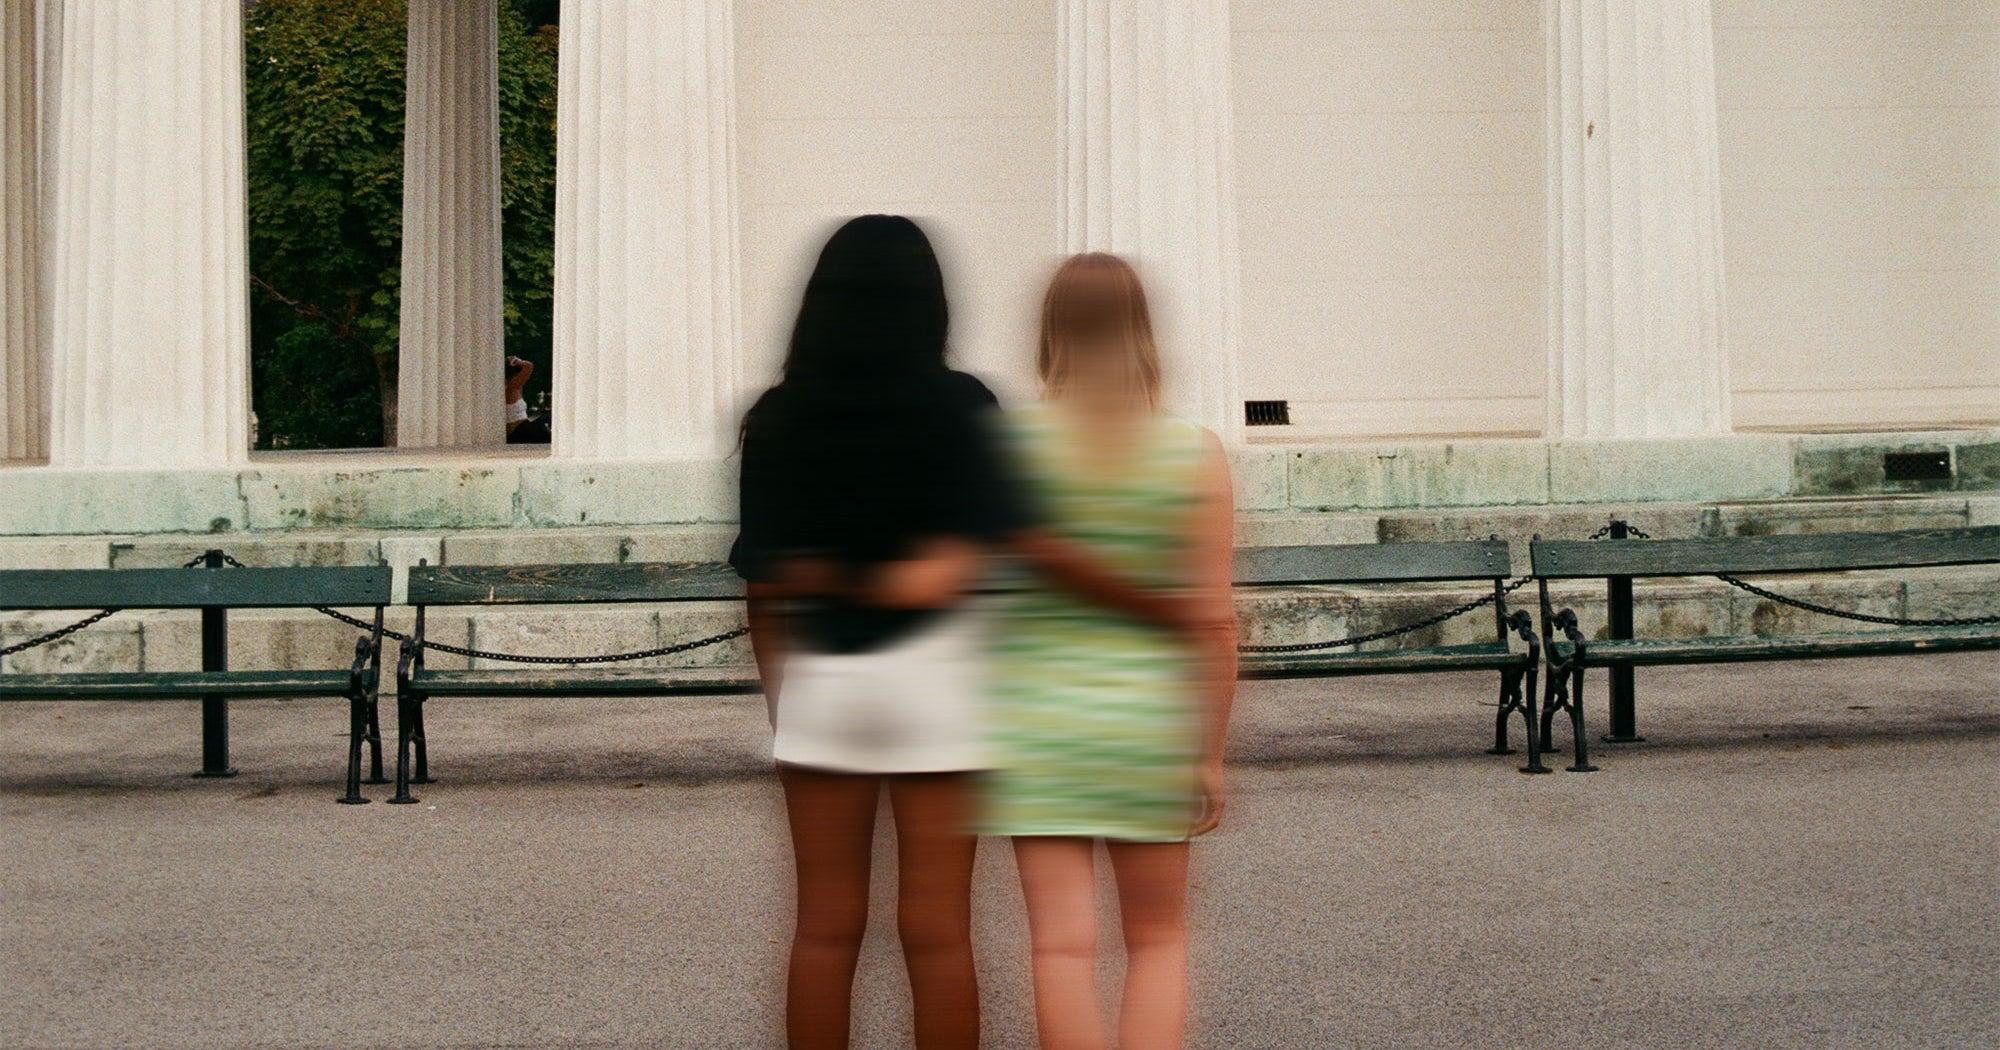 """It Feels Like A Loss"": How COVID Made Friends Drift Apart"